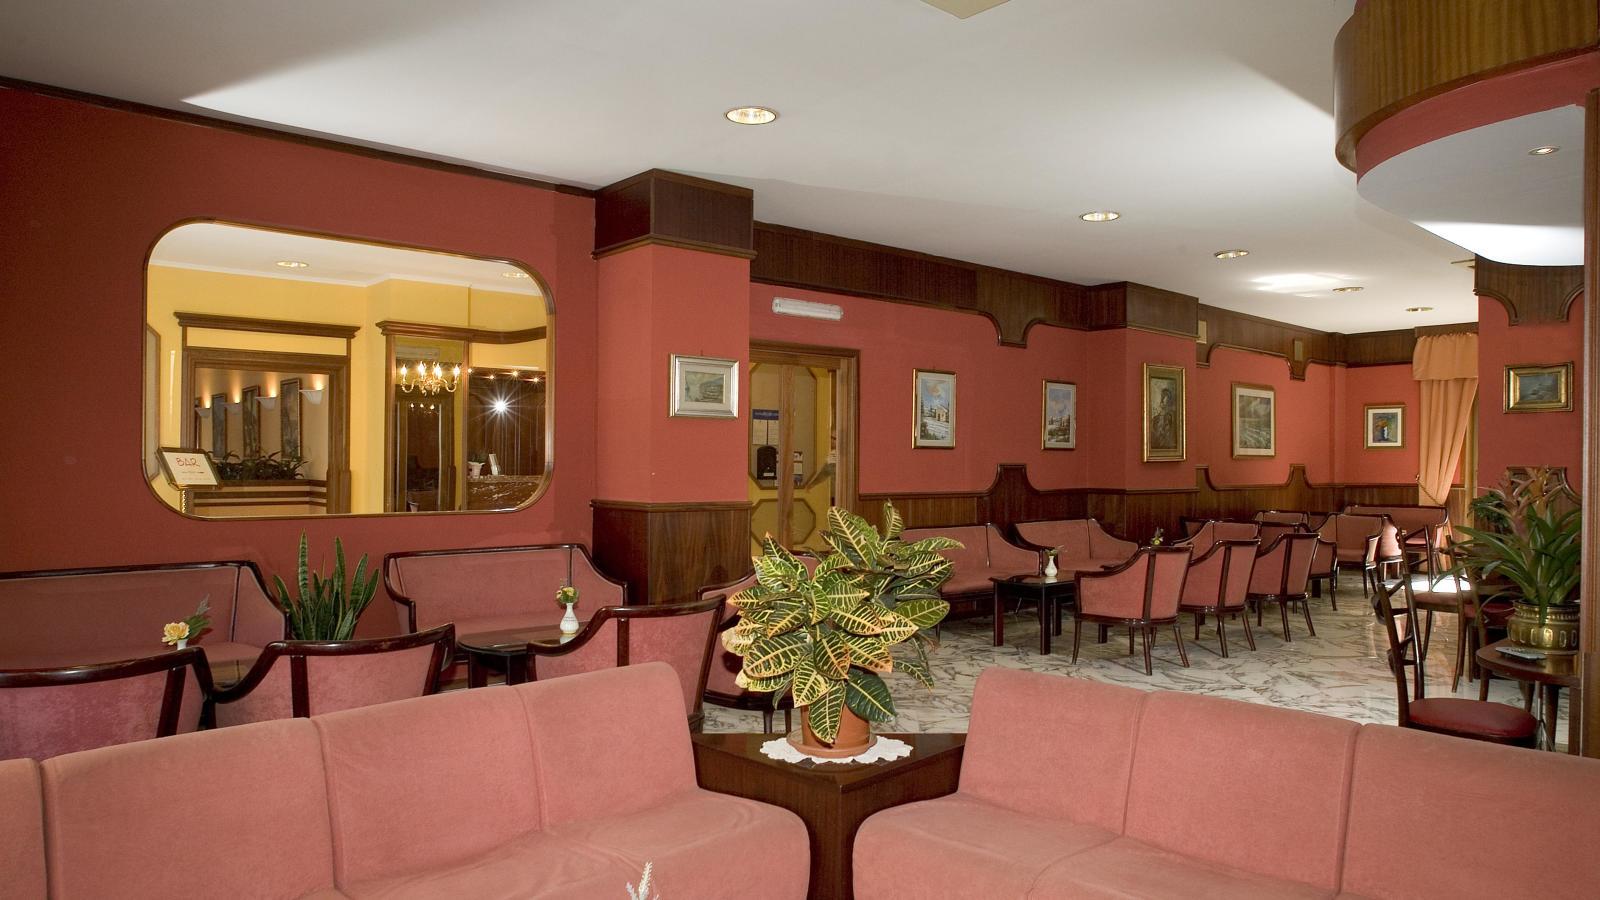 Hotel Ascot Hb Sorrento